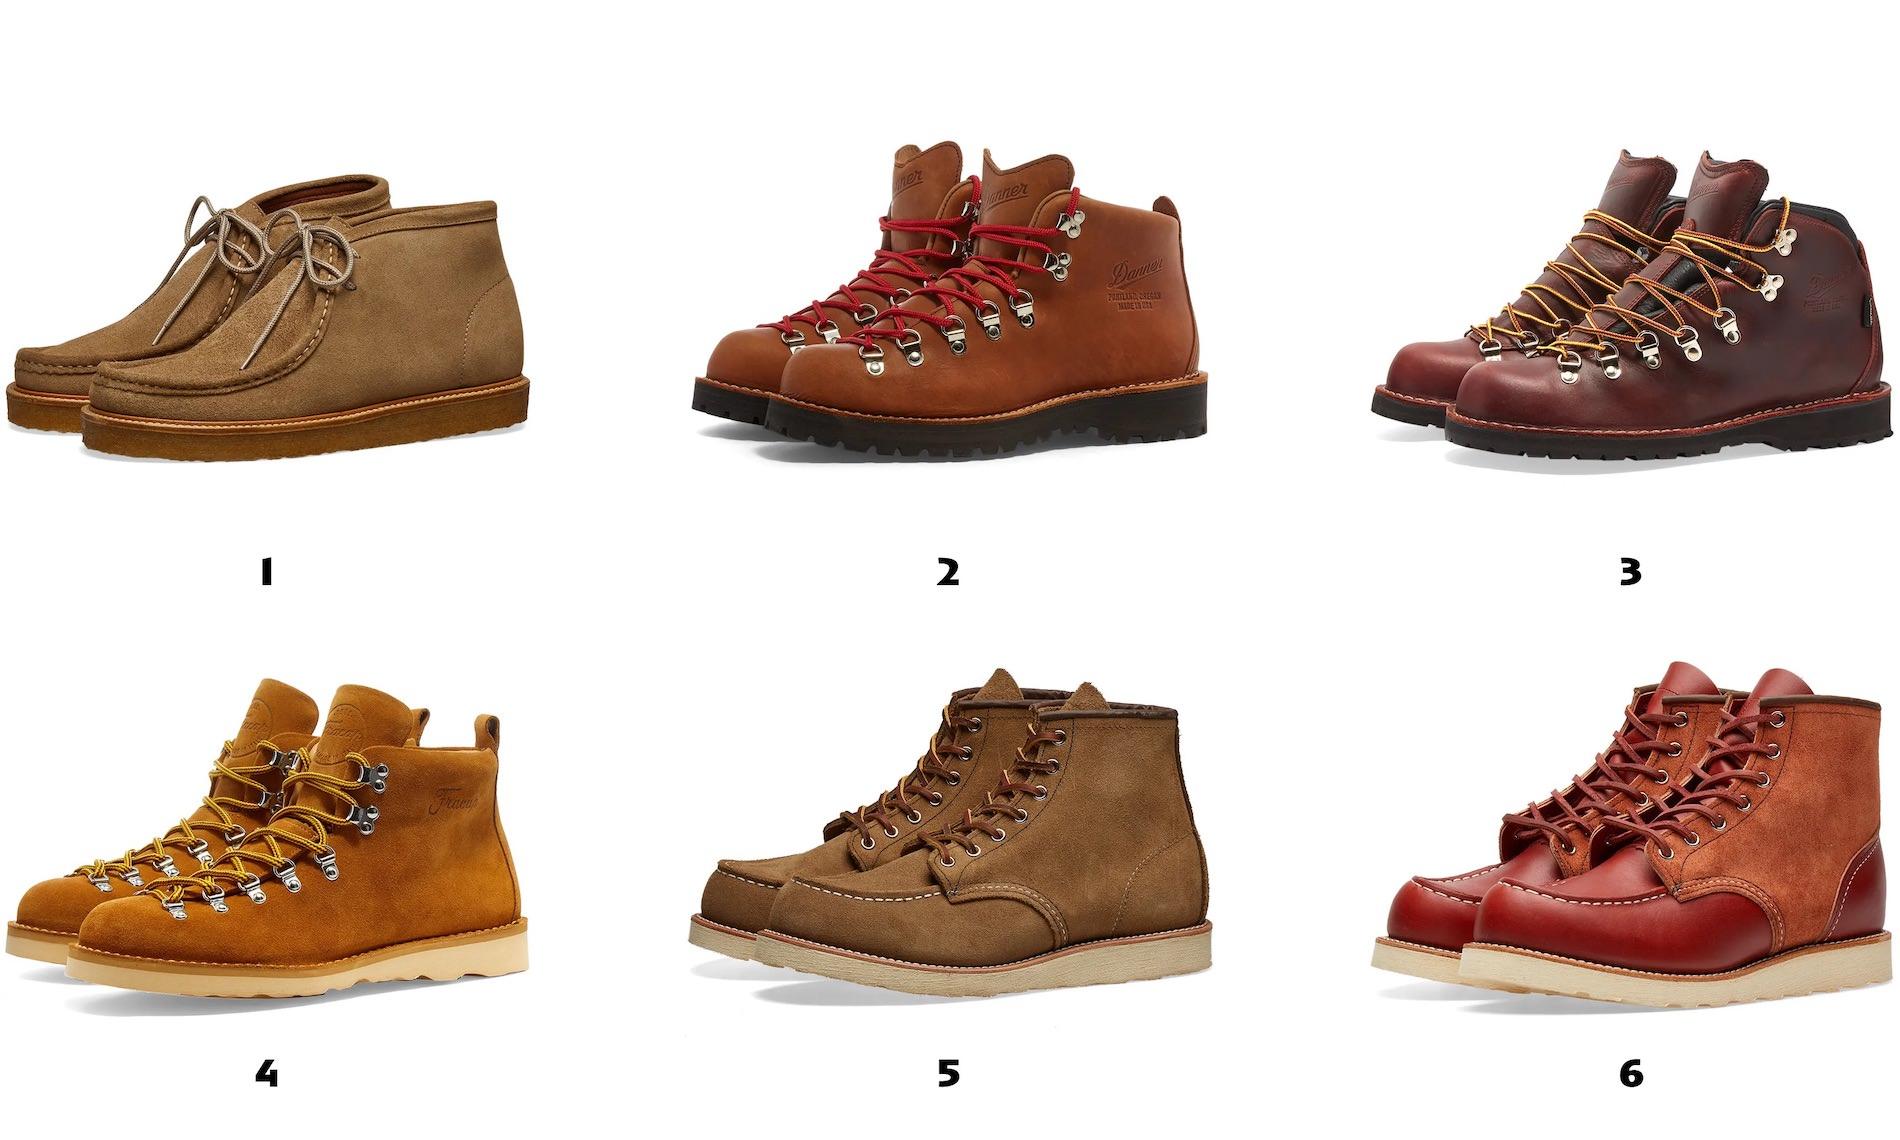 meilleures chaussures decontractees pour homme